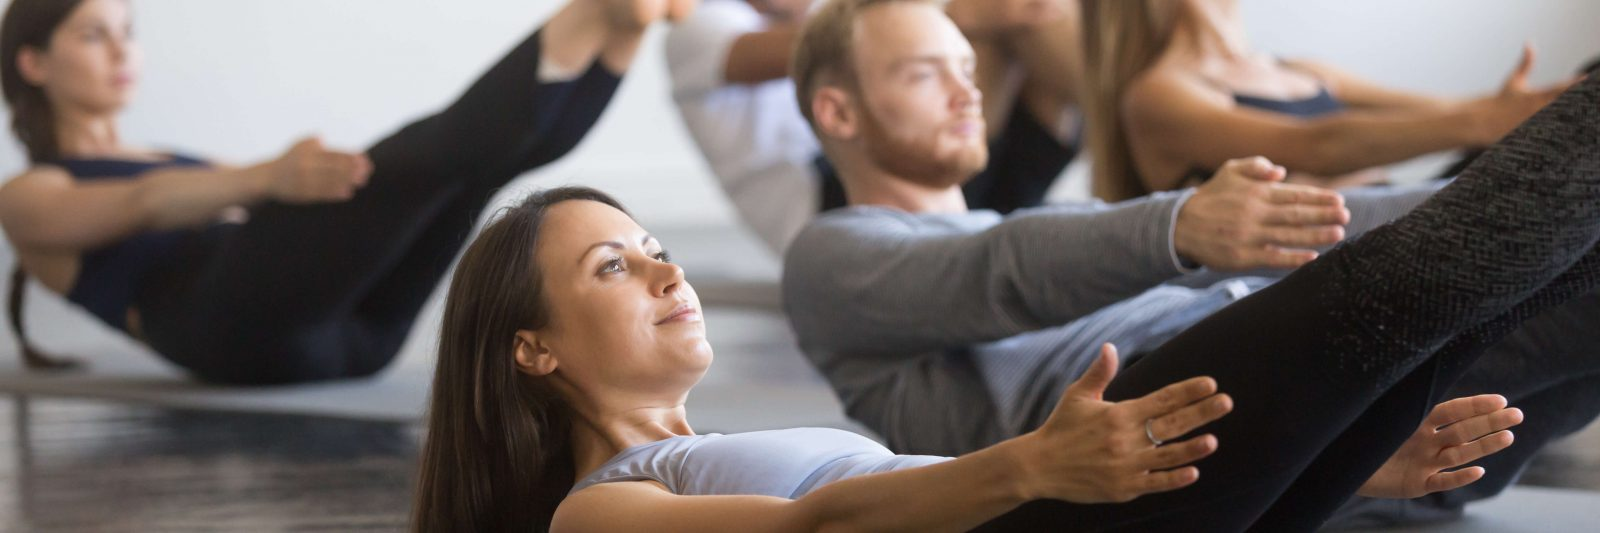 office_Pilates_classes_london